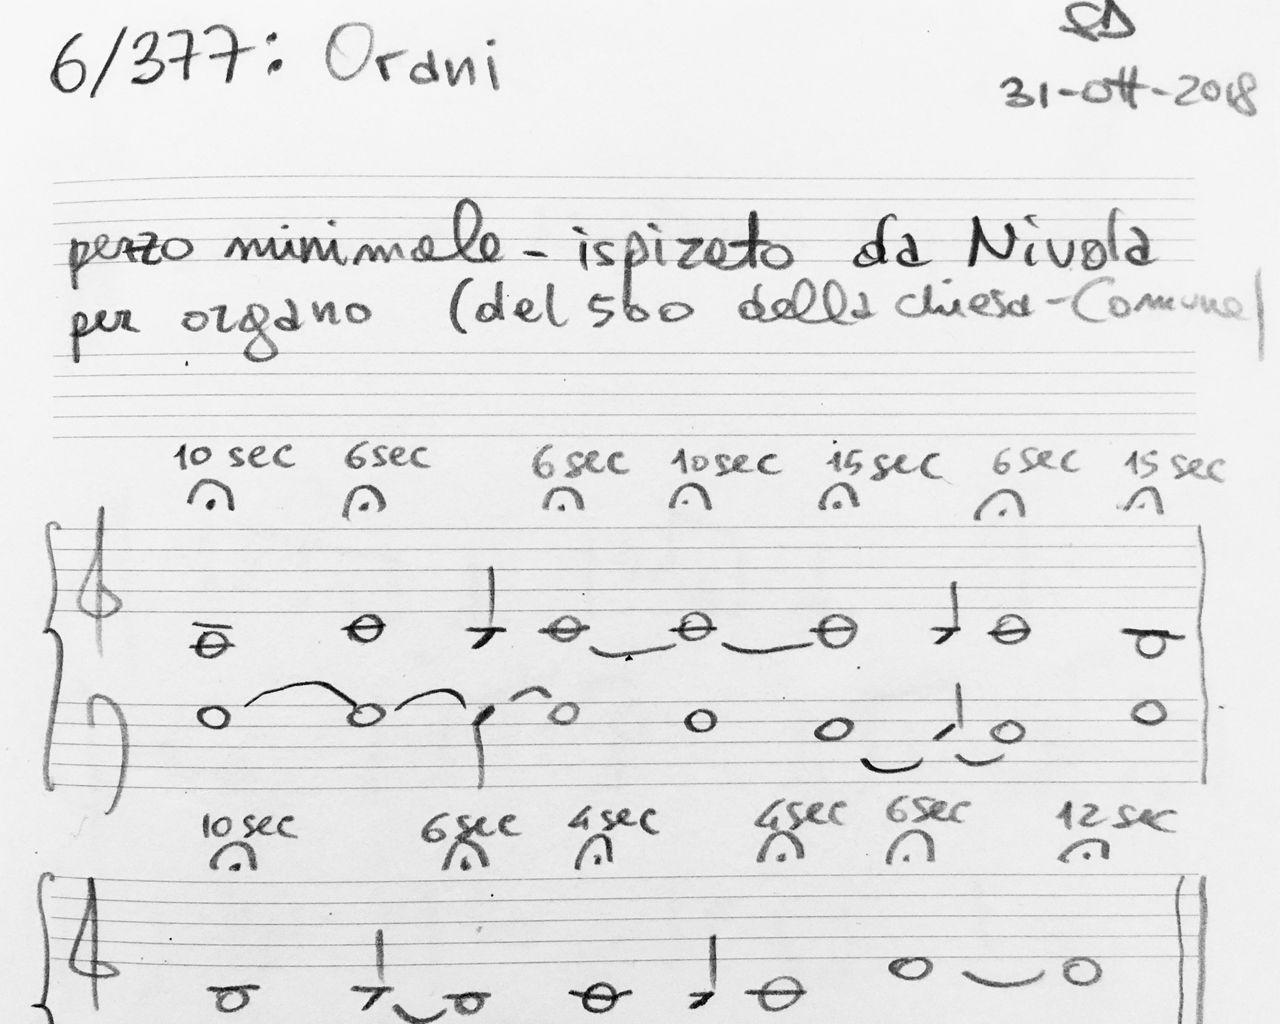 006-Orani-Score